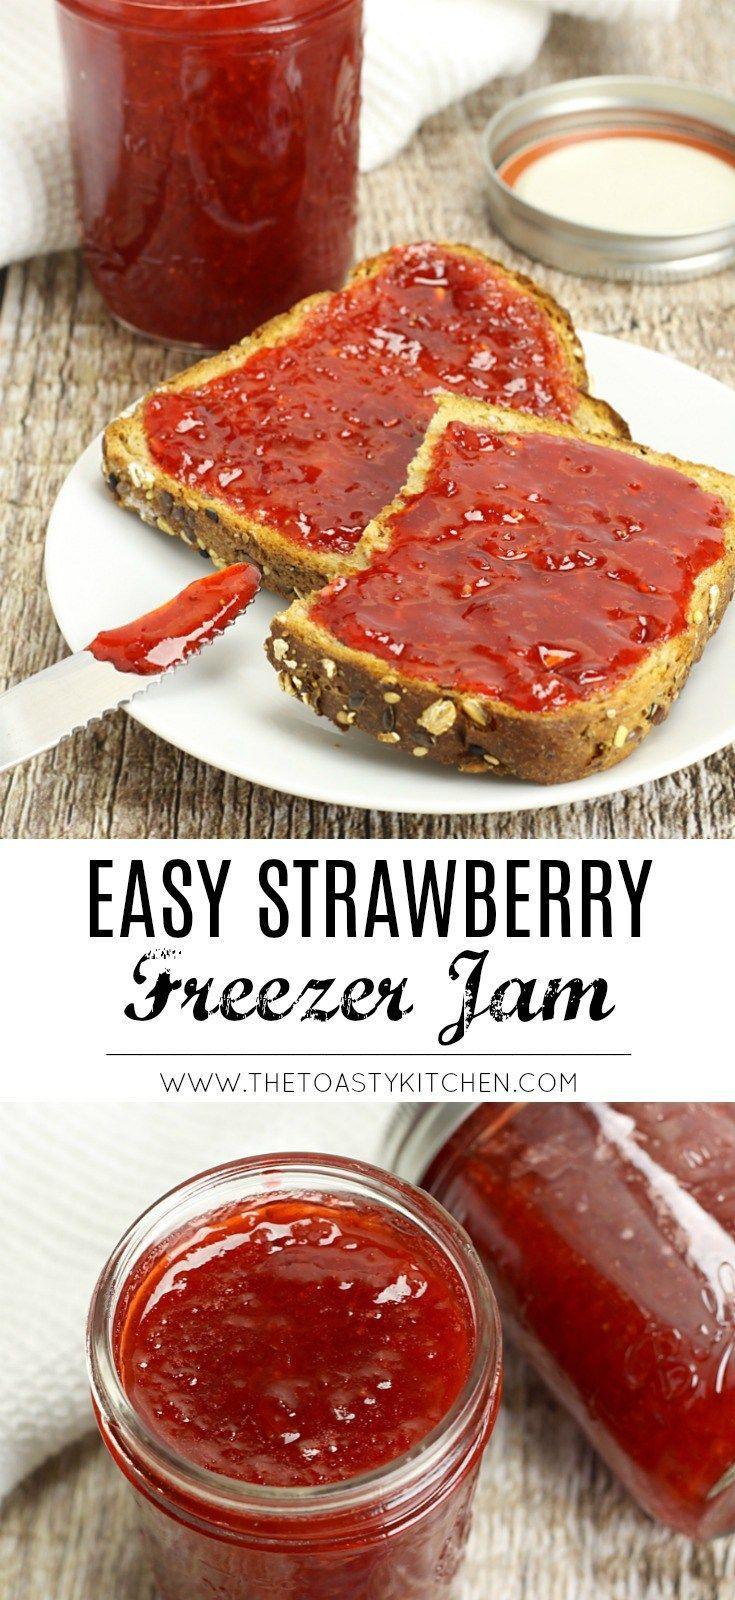 Easy Strawberry Freezer Jam by The Toasty Kitchen